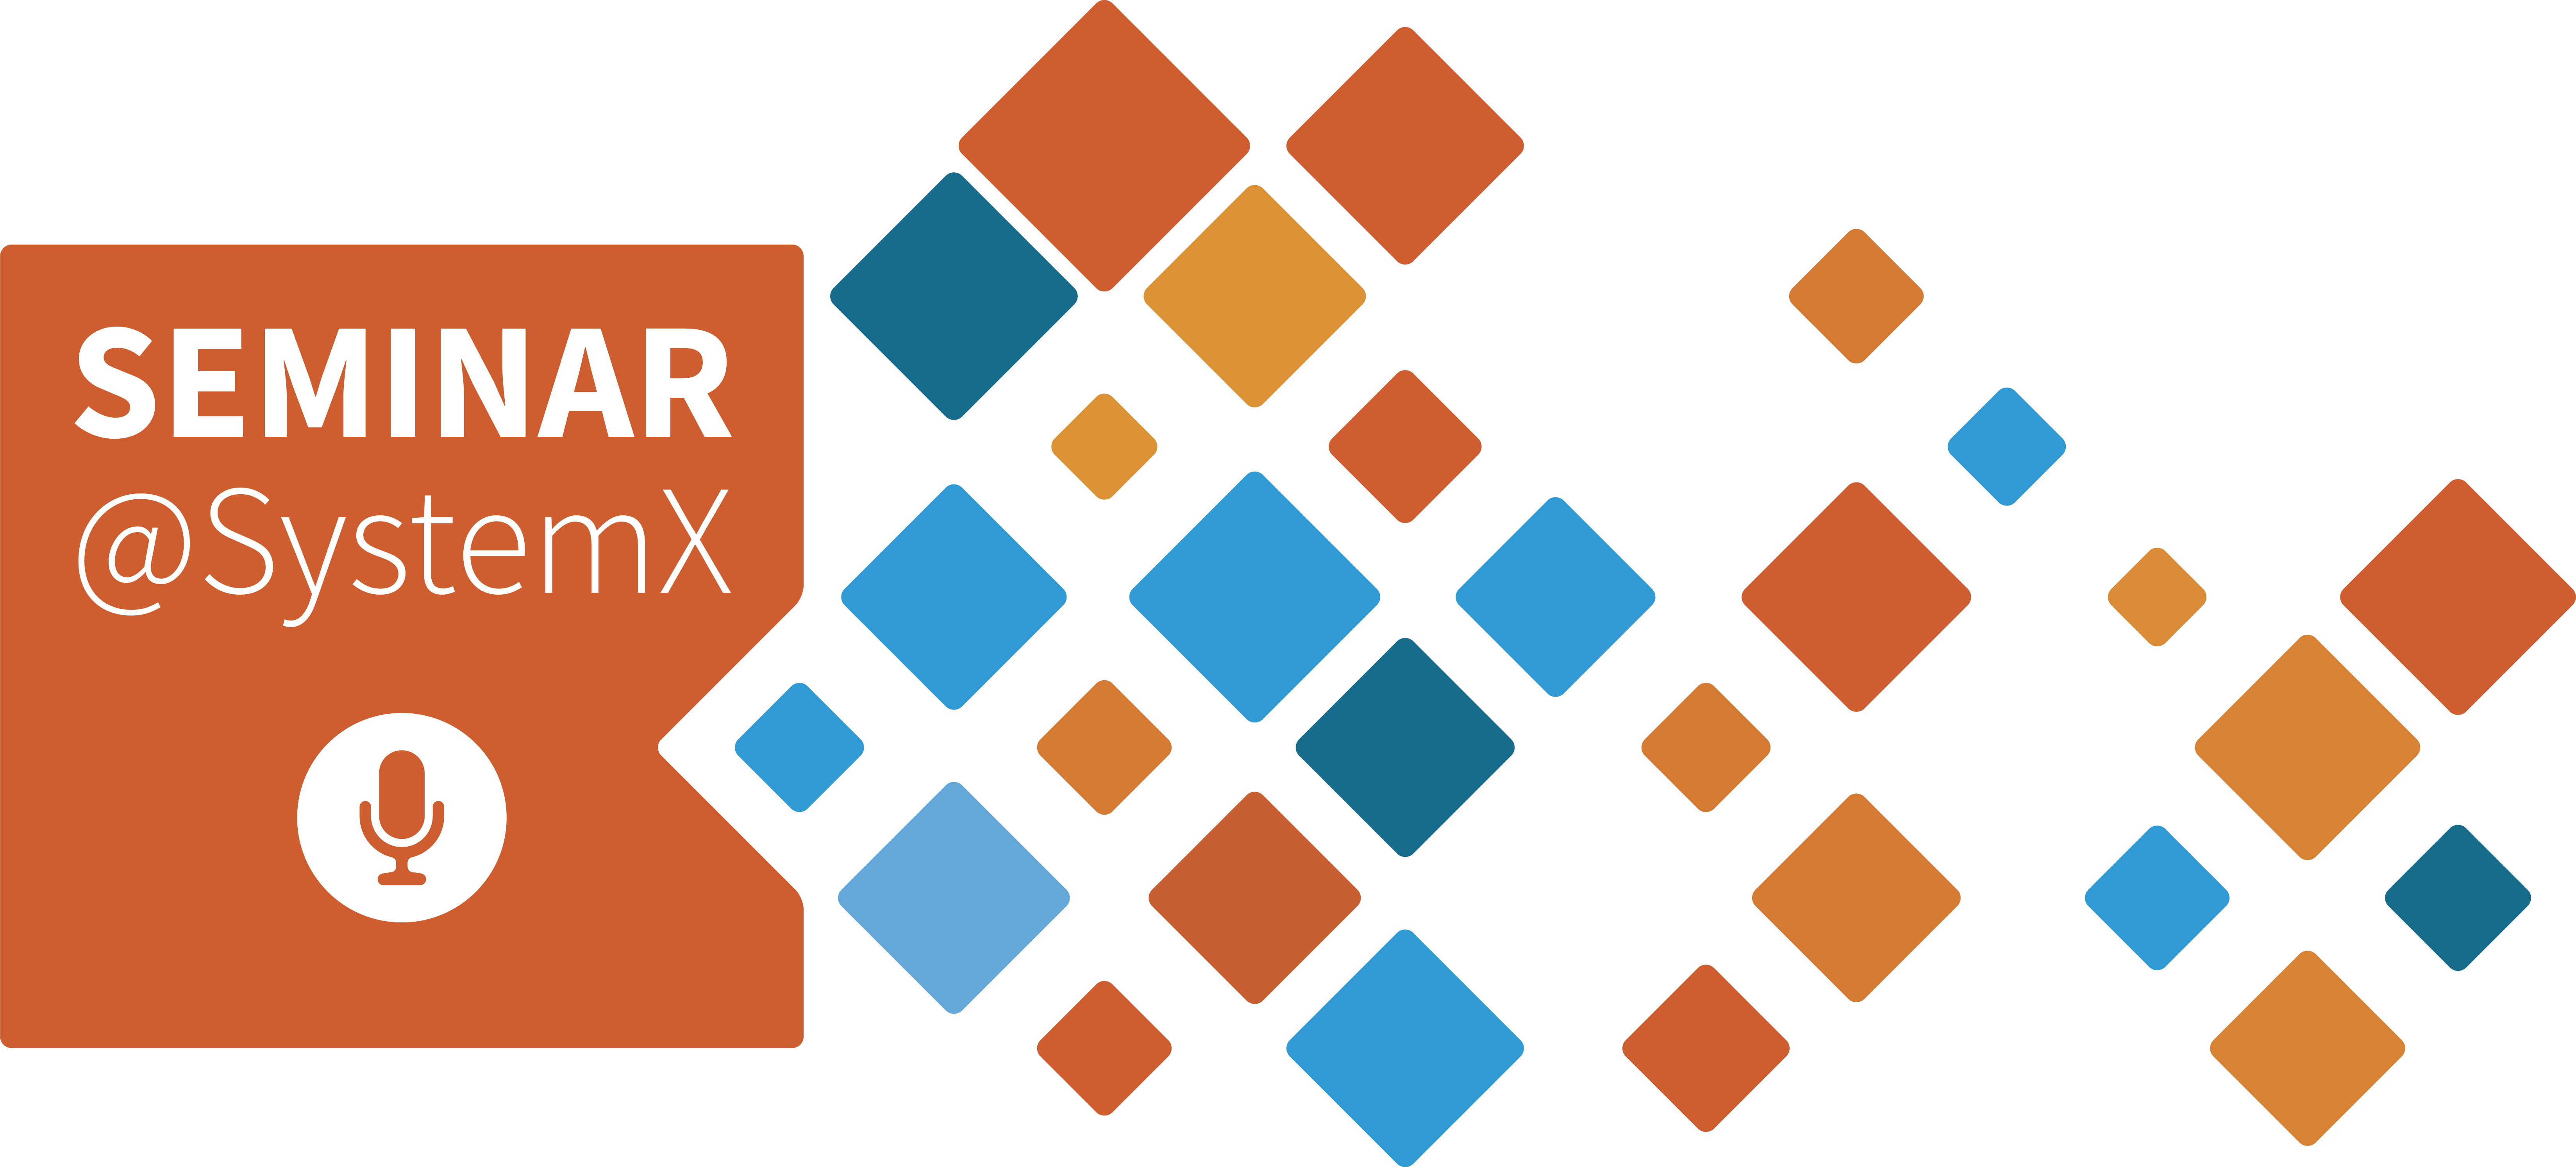 [27 octobre] Arnaud Gotlieb animera un Seminar@SystemX